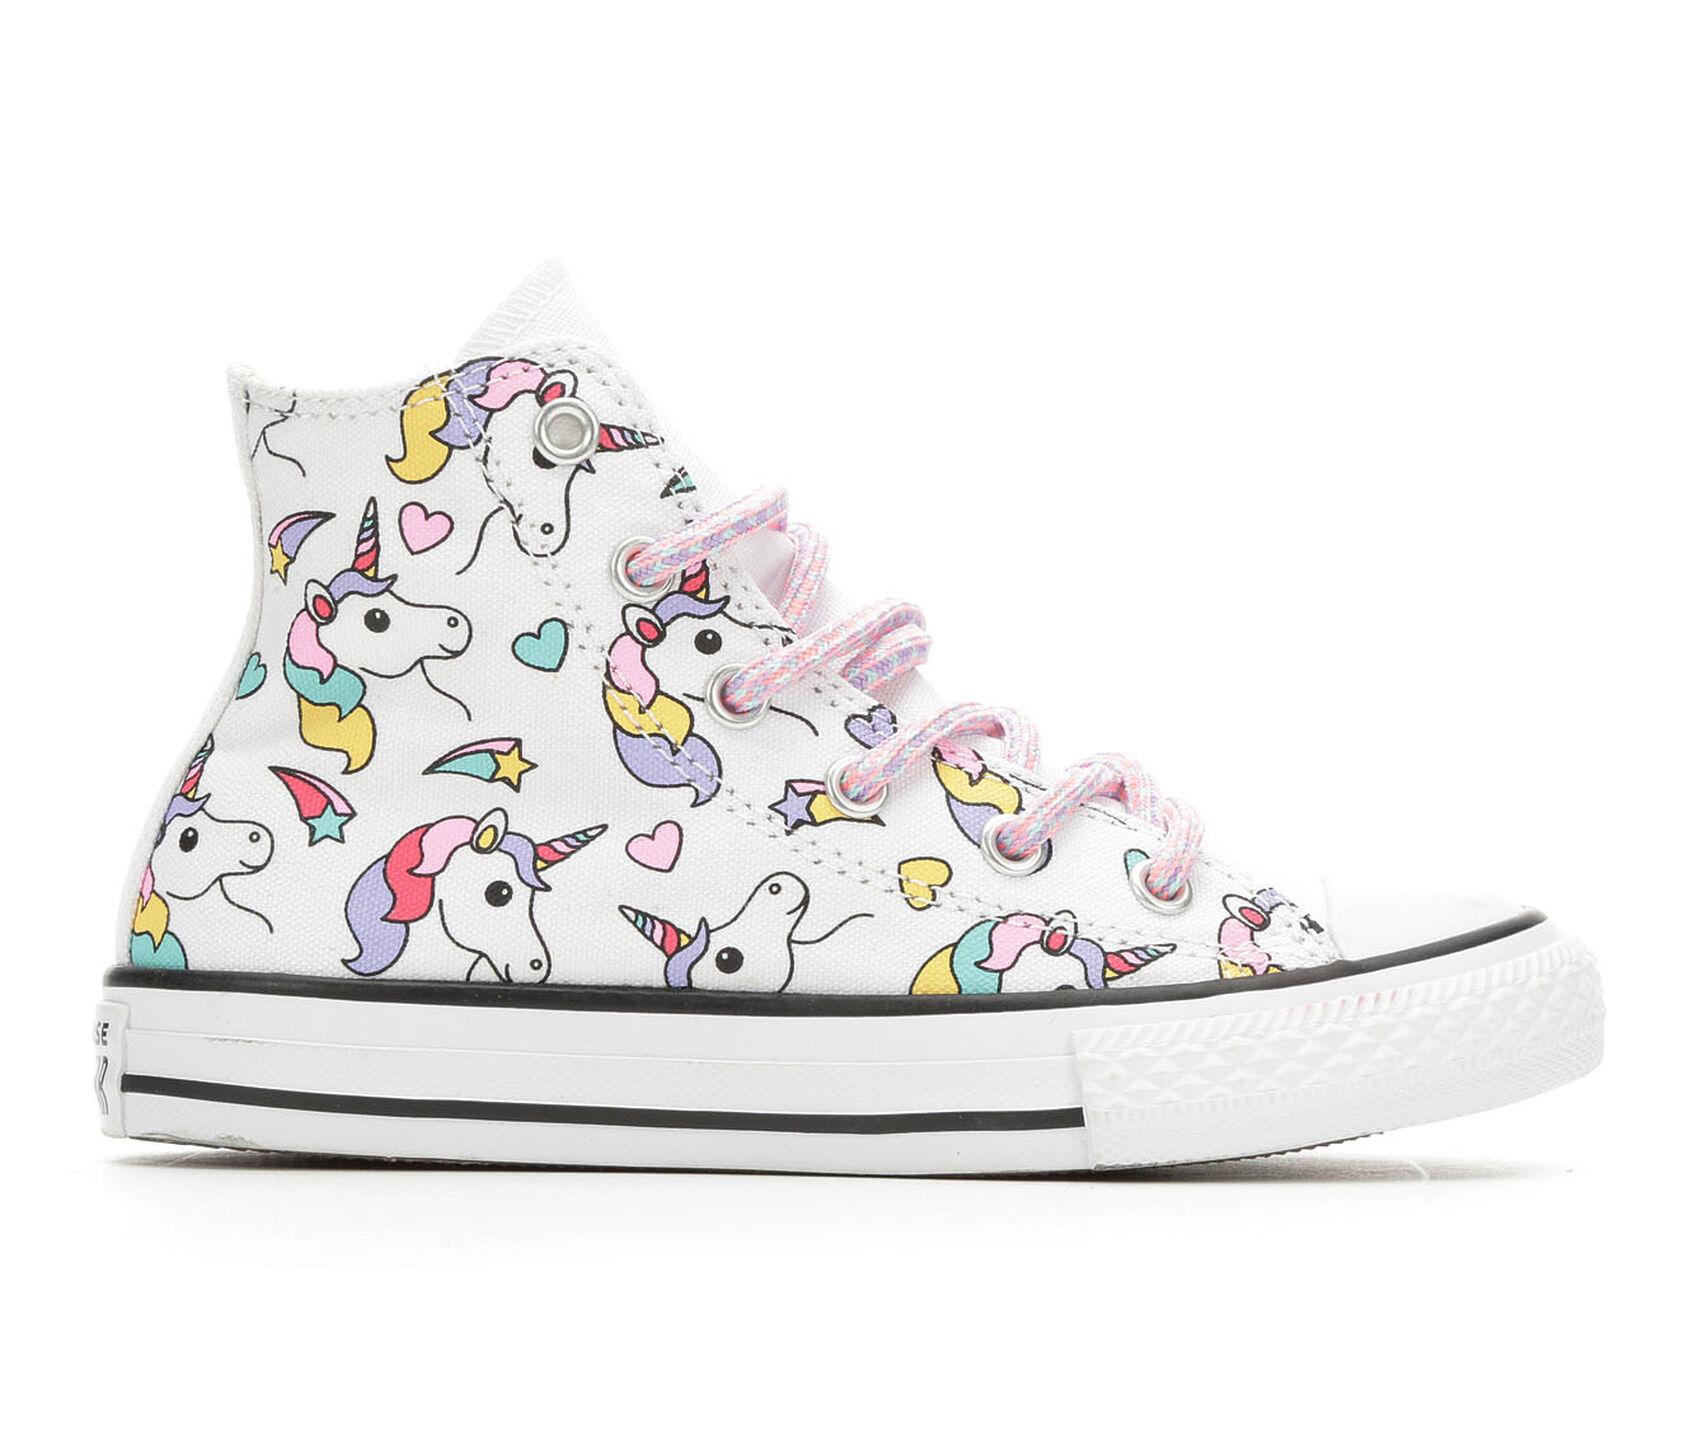 cd0a50108cf437 ... Converse Little Kid  amp  Big Kid CTAS Rainbow Unicorn Hi Sneakers.  Previous